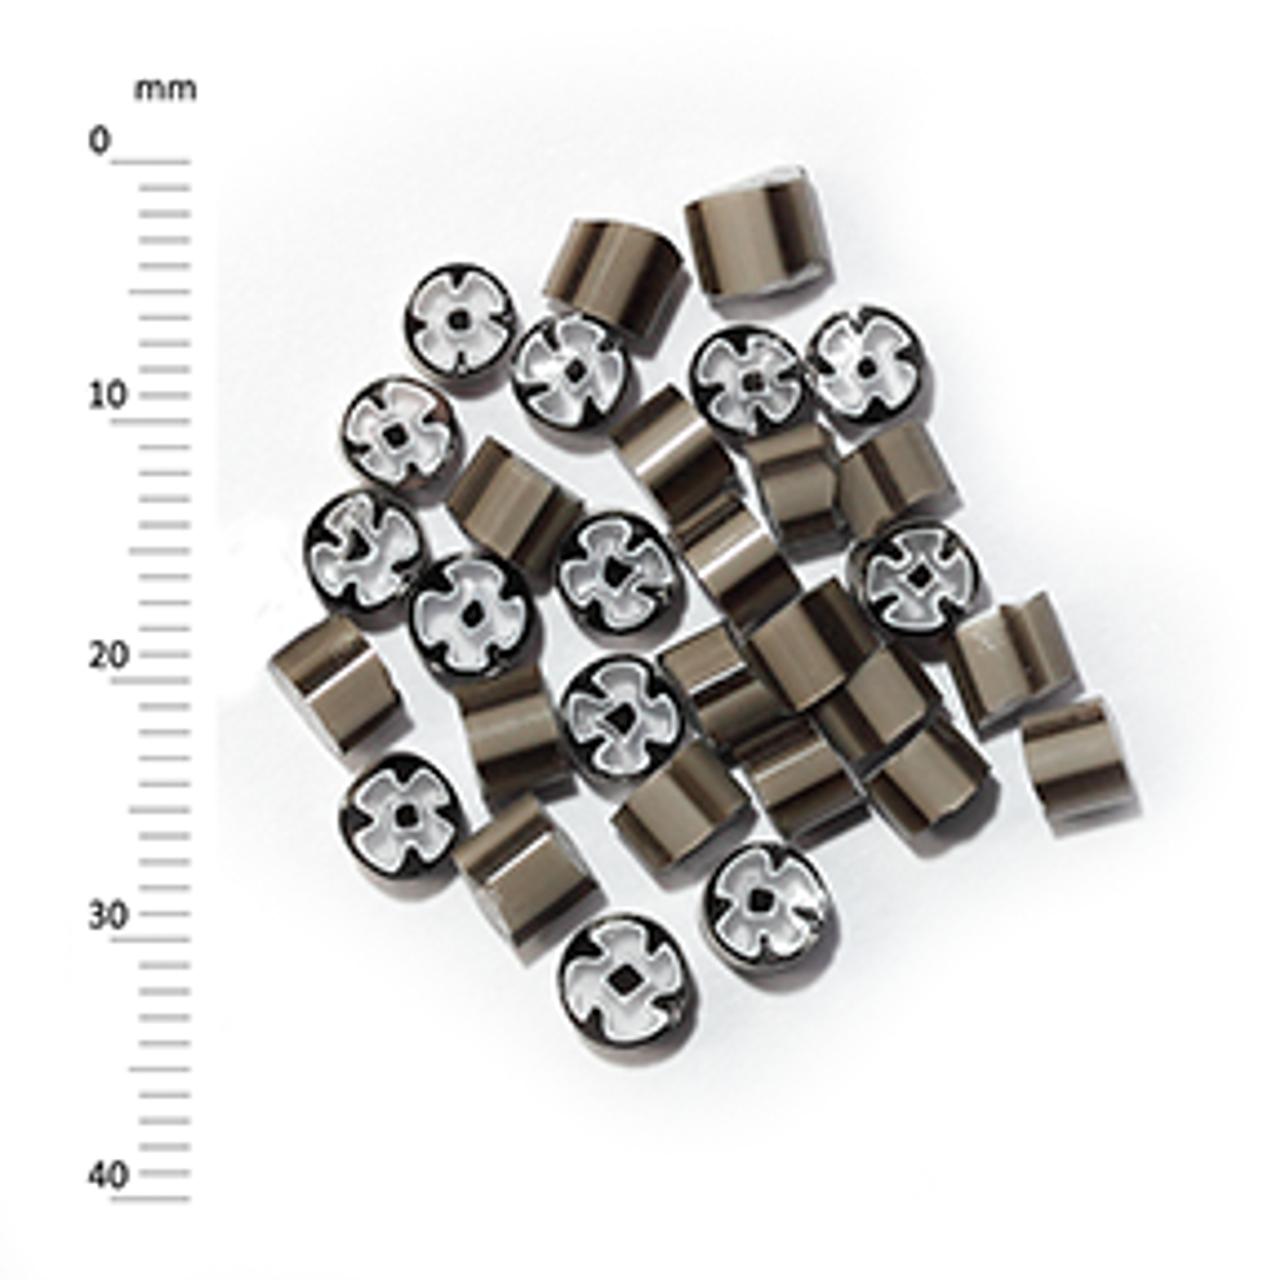 Millefiori - 50g pack (M060), brown, 4-5mm